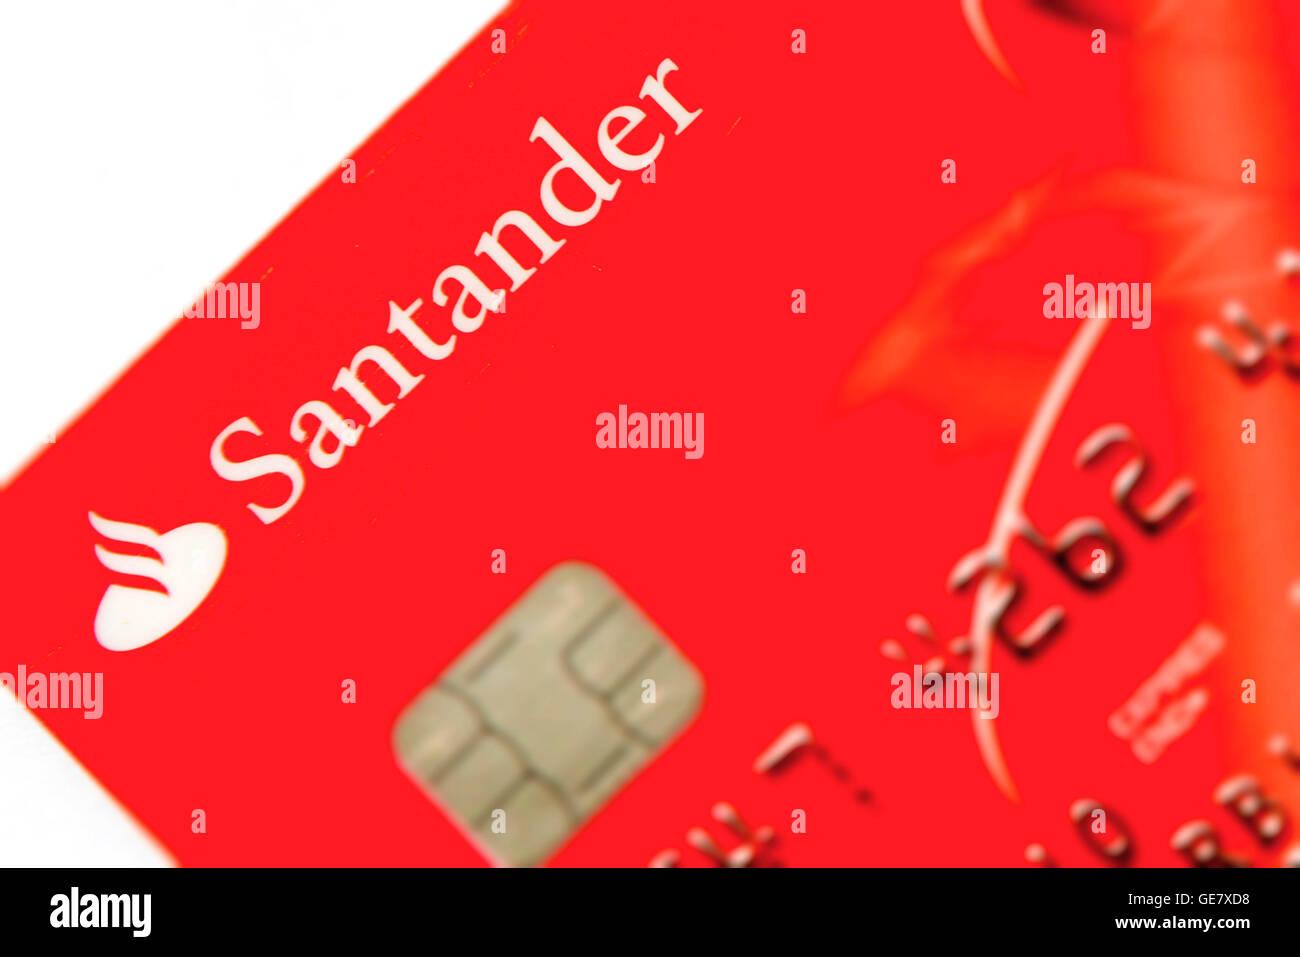 Santander Credit Card Stock Photos & Santander Credit Card Stock ...